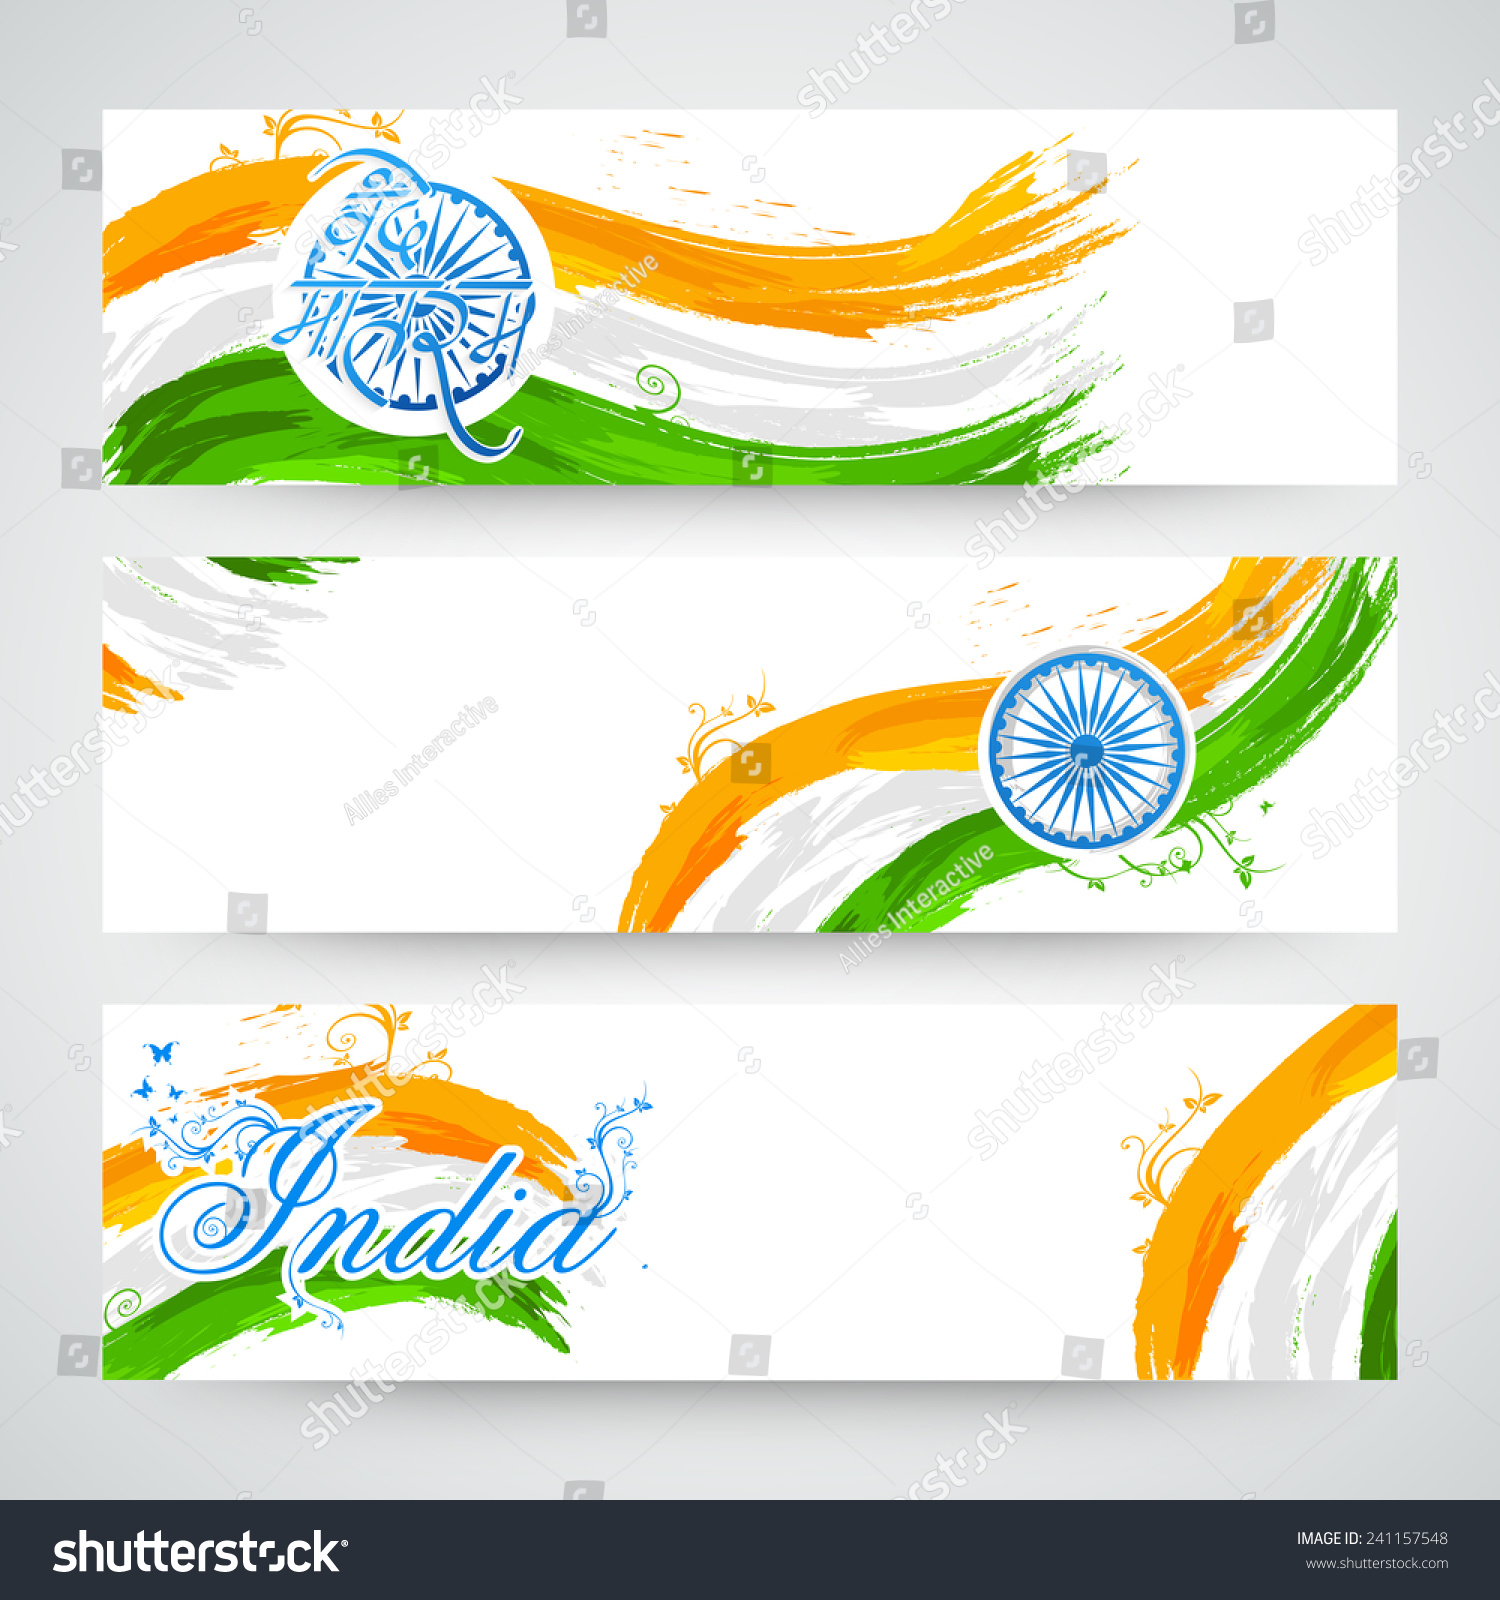 Colors website ashoka - Website Header Or Banner With Ashoka Wheel And Hindi Text Vande Mataram I Praise Thee